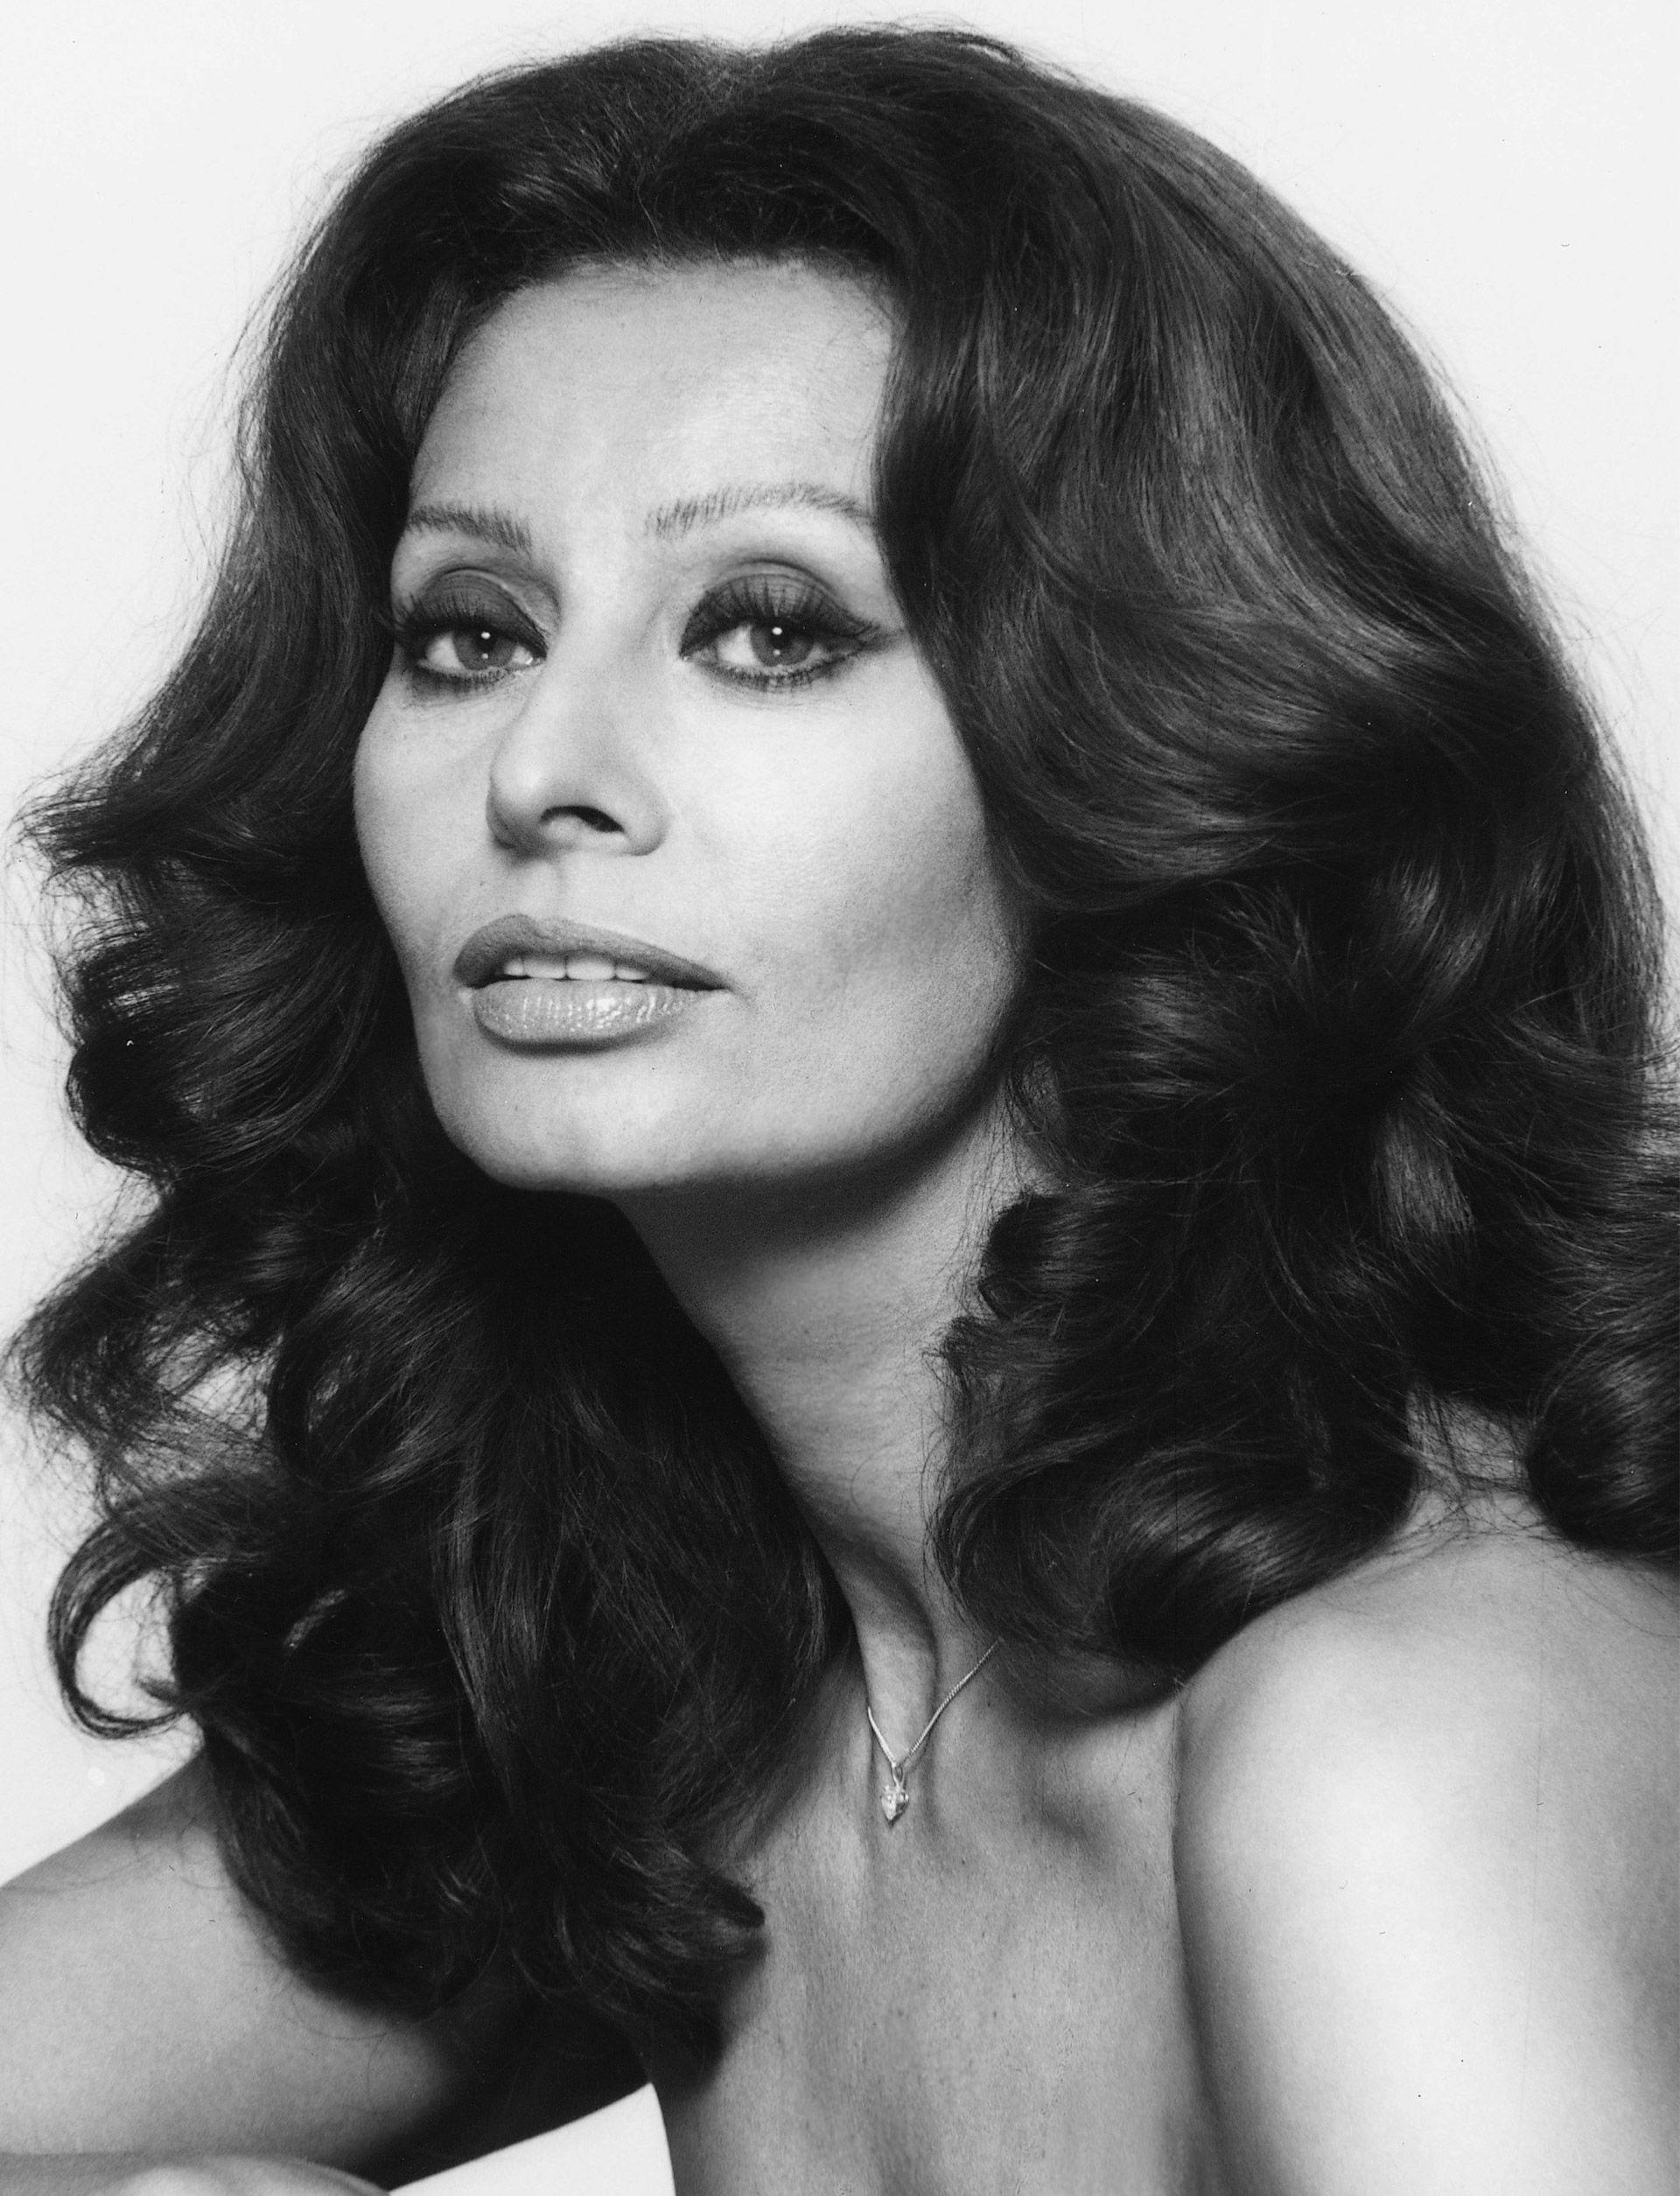 10 Retro Hairstyles That Still Look Trendy | Sophia loren ...